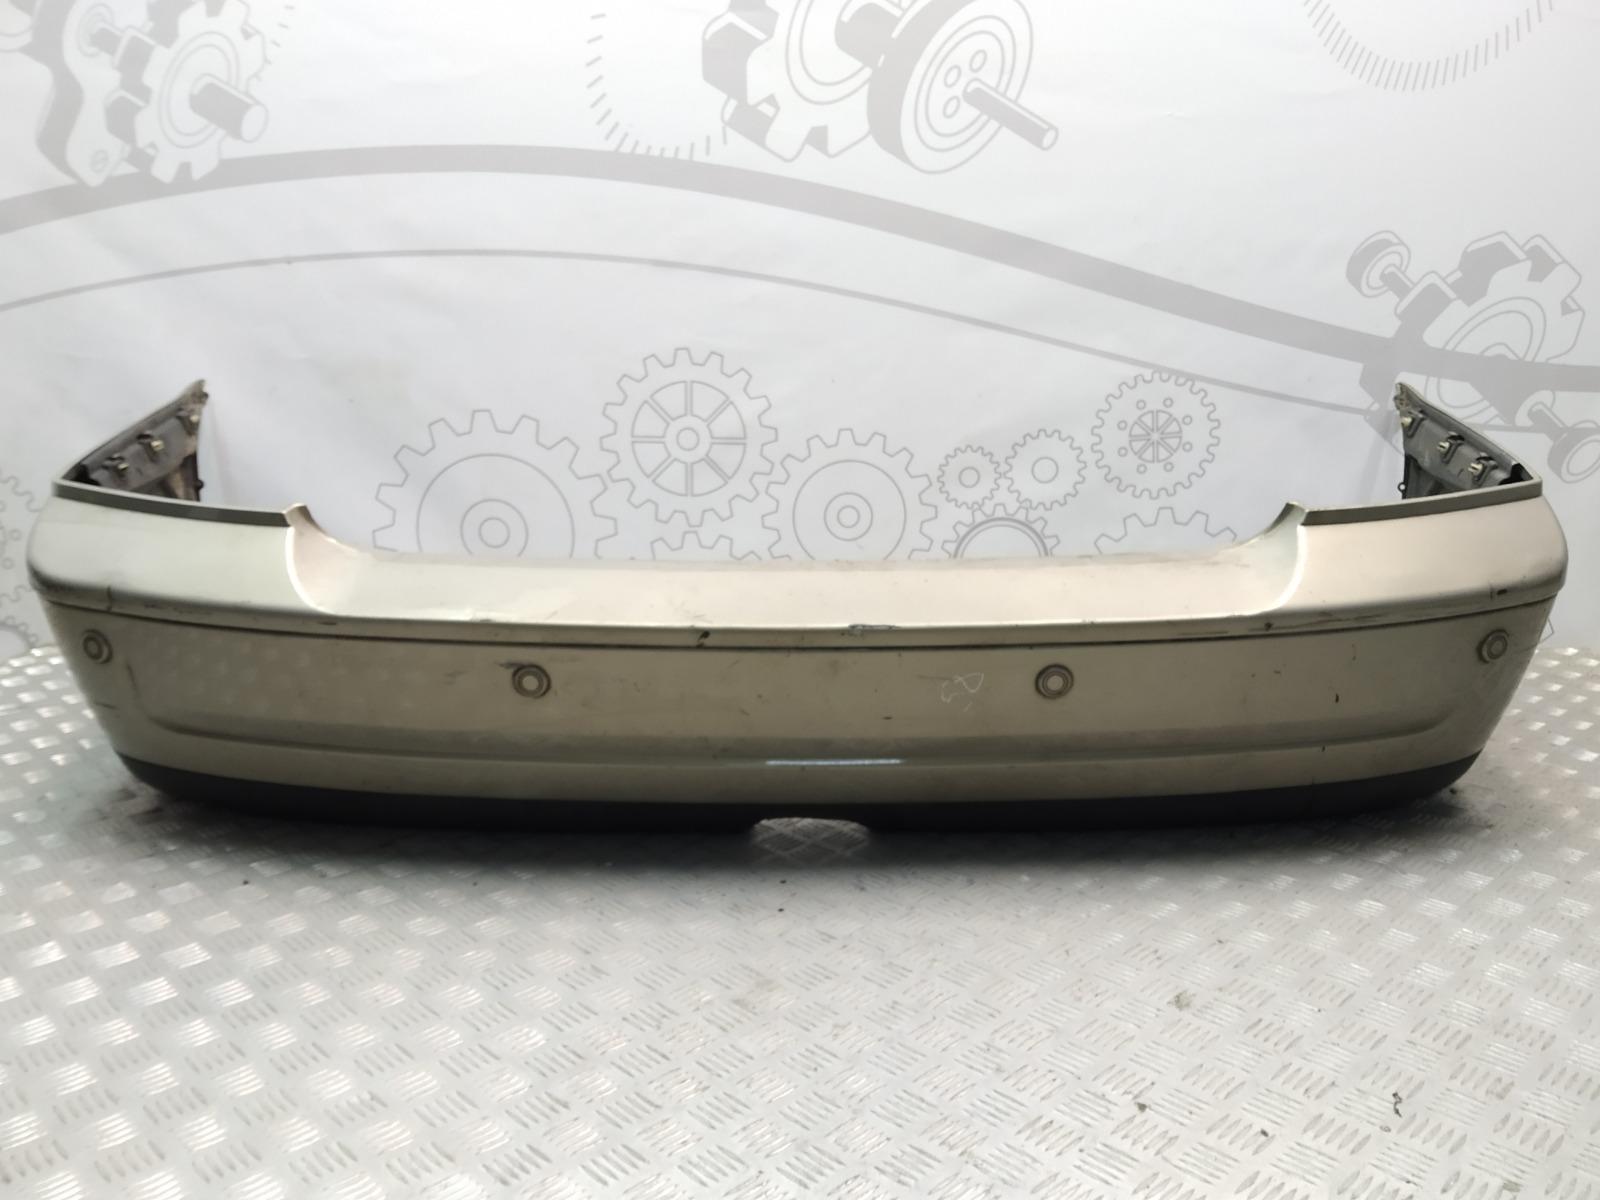 Бампер задний Volvo S80 2.4 D5 2004 (б/у)